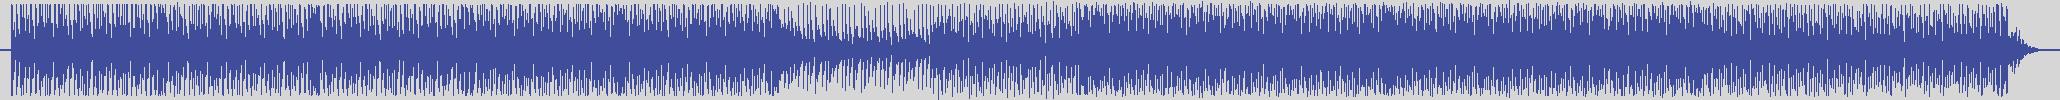 workin [WRK004] Donald Teixeira - Contemplation [Plastic Bass Mix] audio wave form